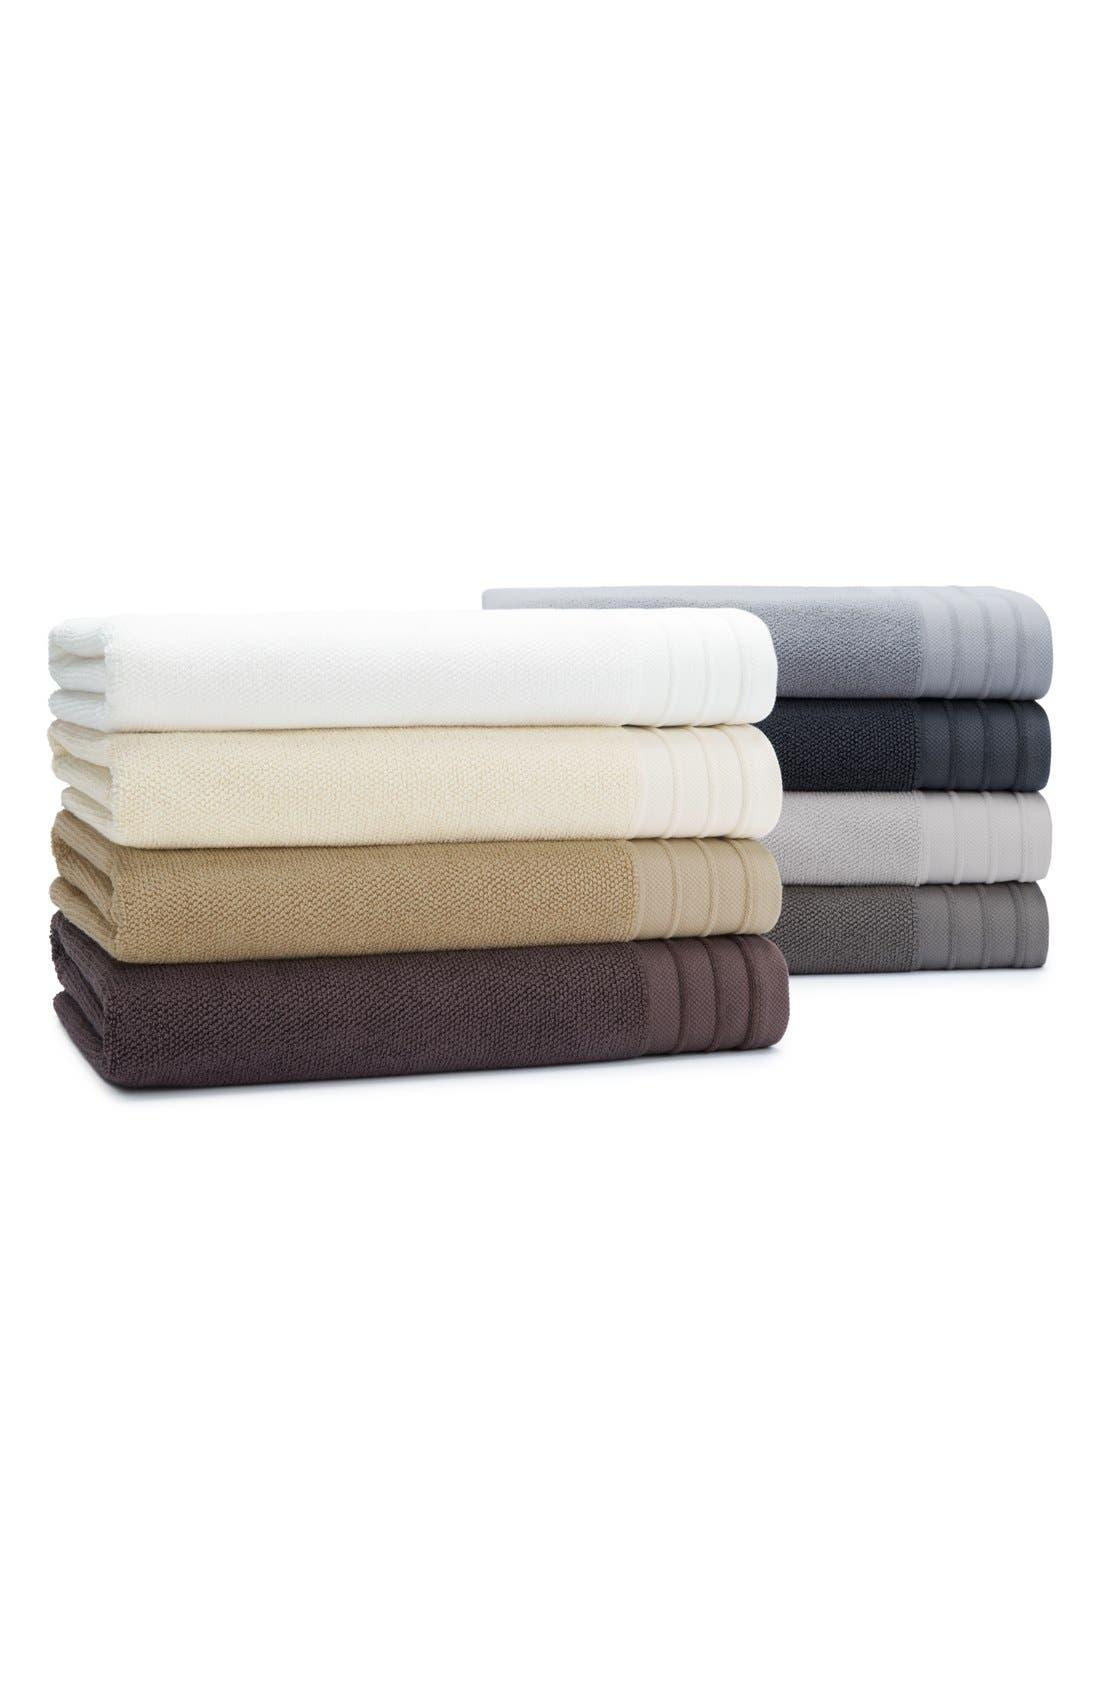 Classic Luxe Hand Towel,                             Alternate thumbnail 4, color,                             GRANITE